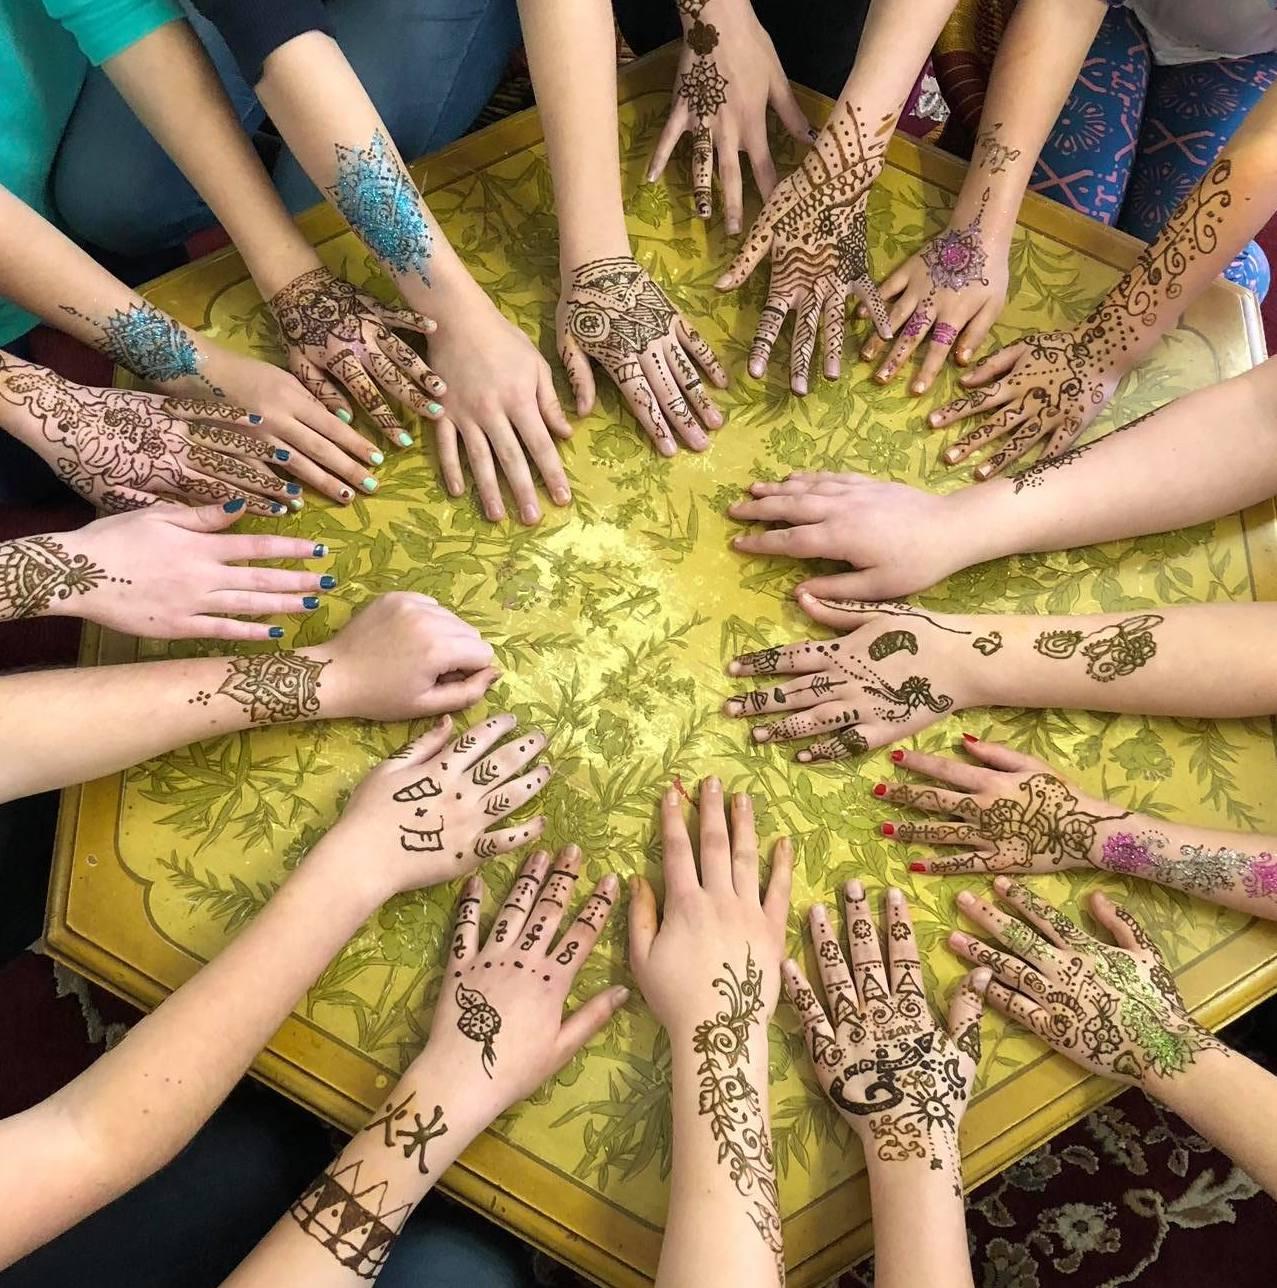 The Eye of Henna & 13 Moons Tattoo